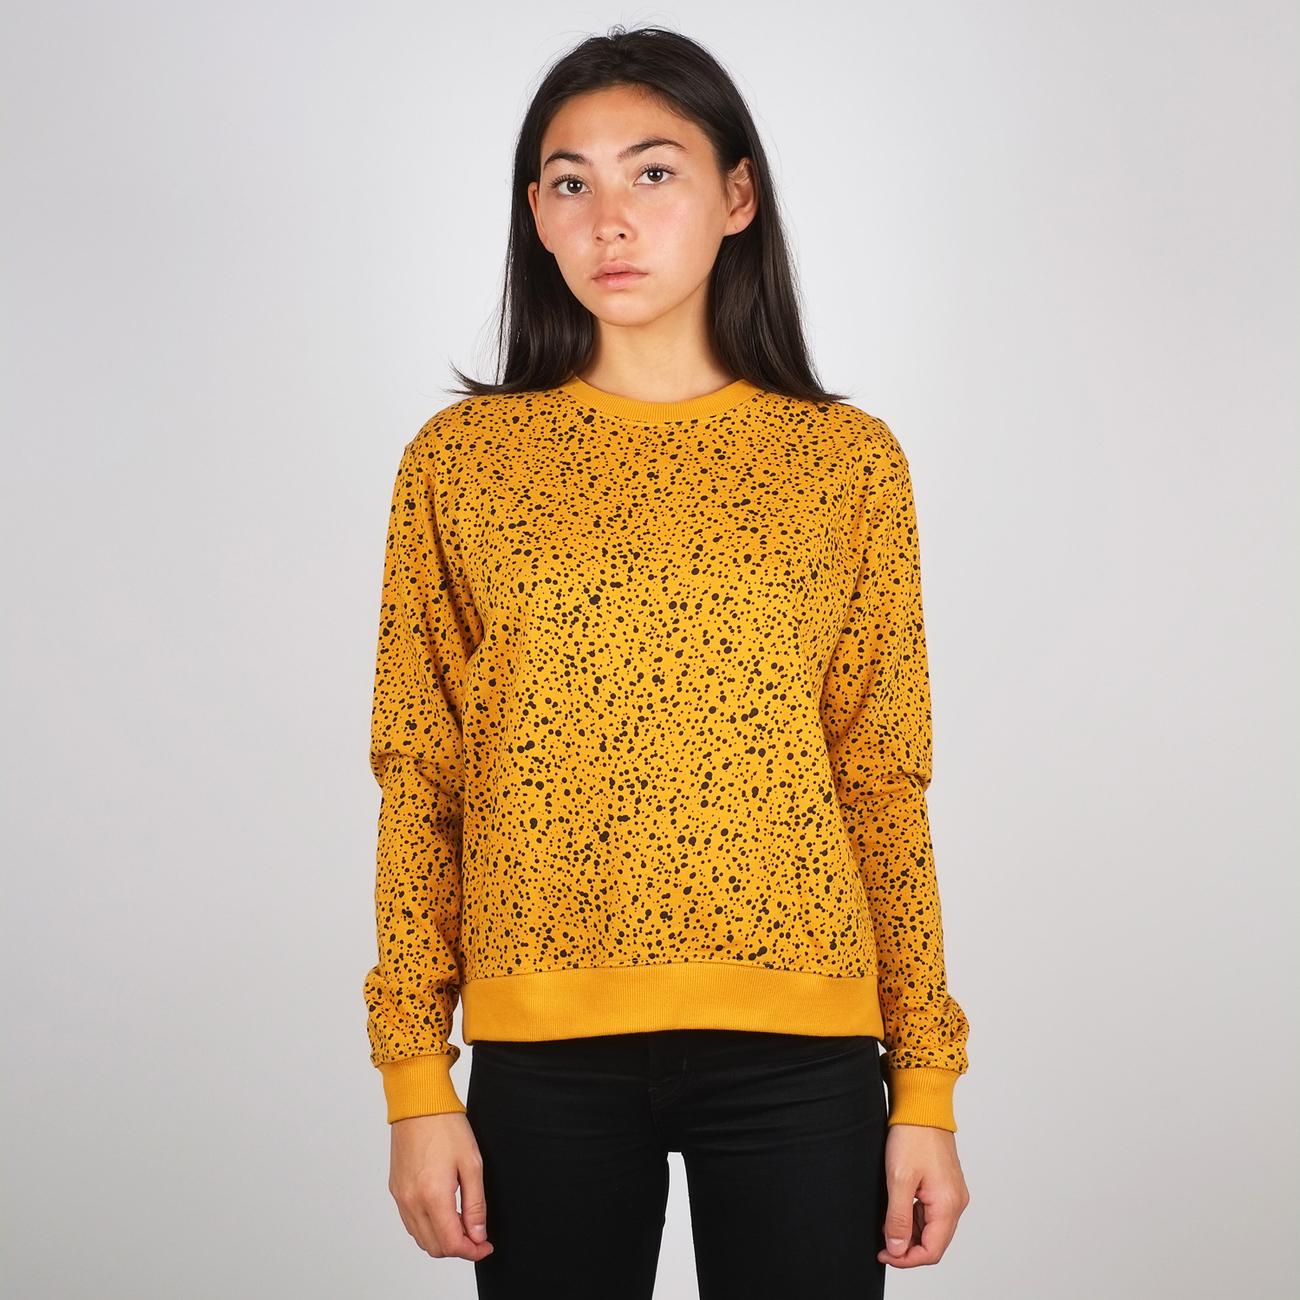 Sweatshirt Ystad Dots Mustard